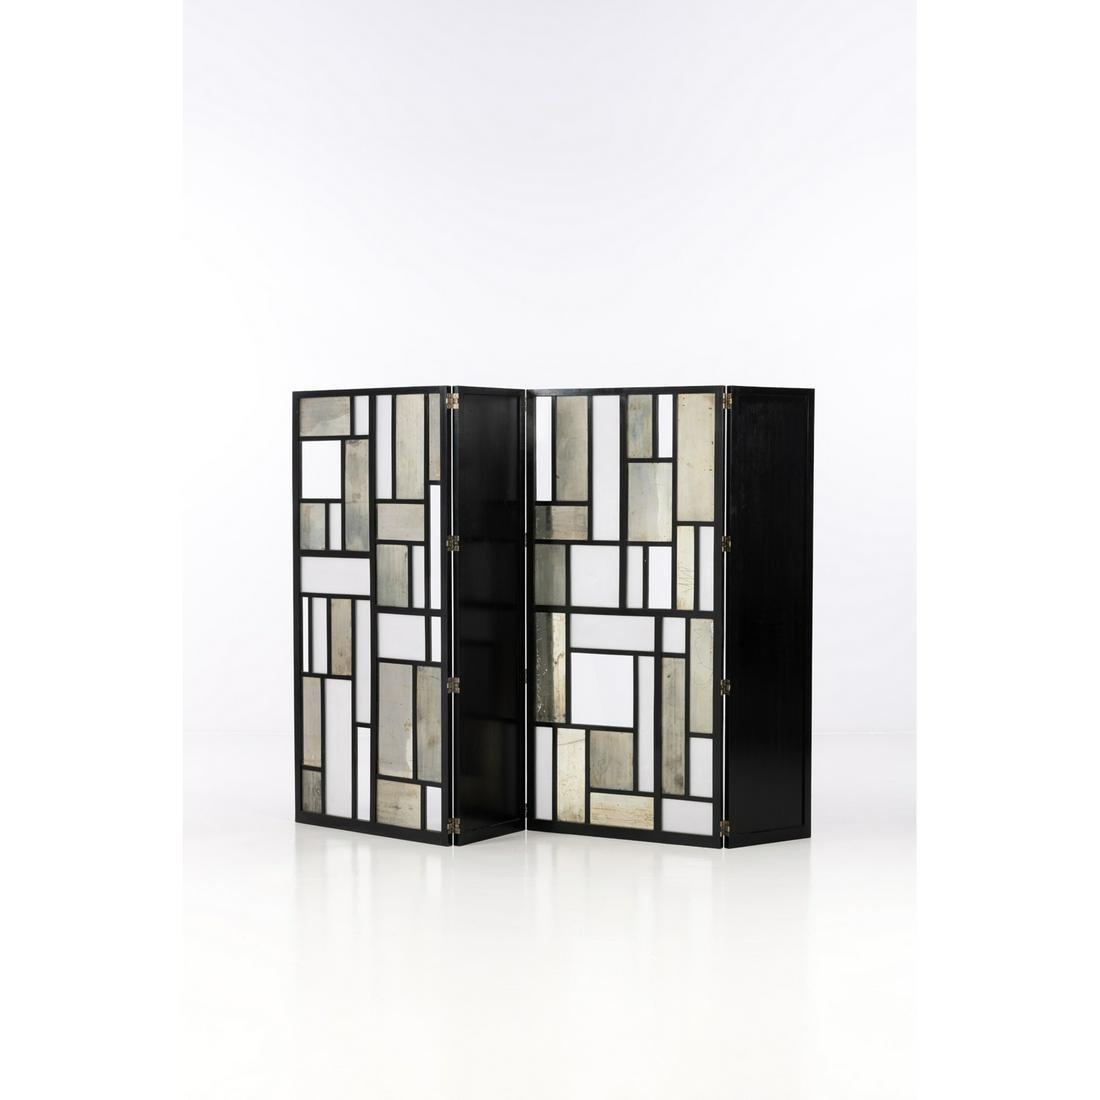 Carlo Scarpa (1906-1978) Four-leaved screen  Blackened